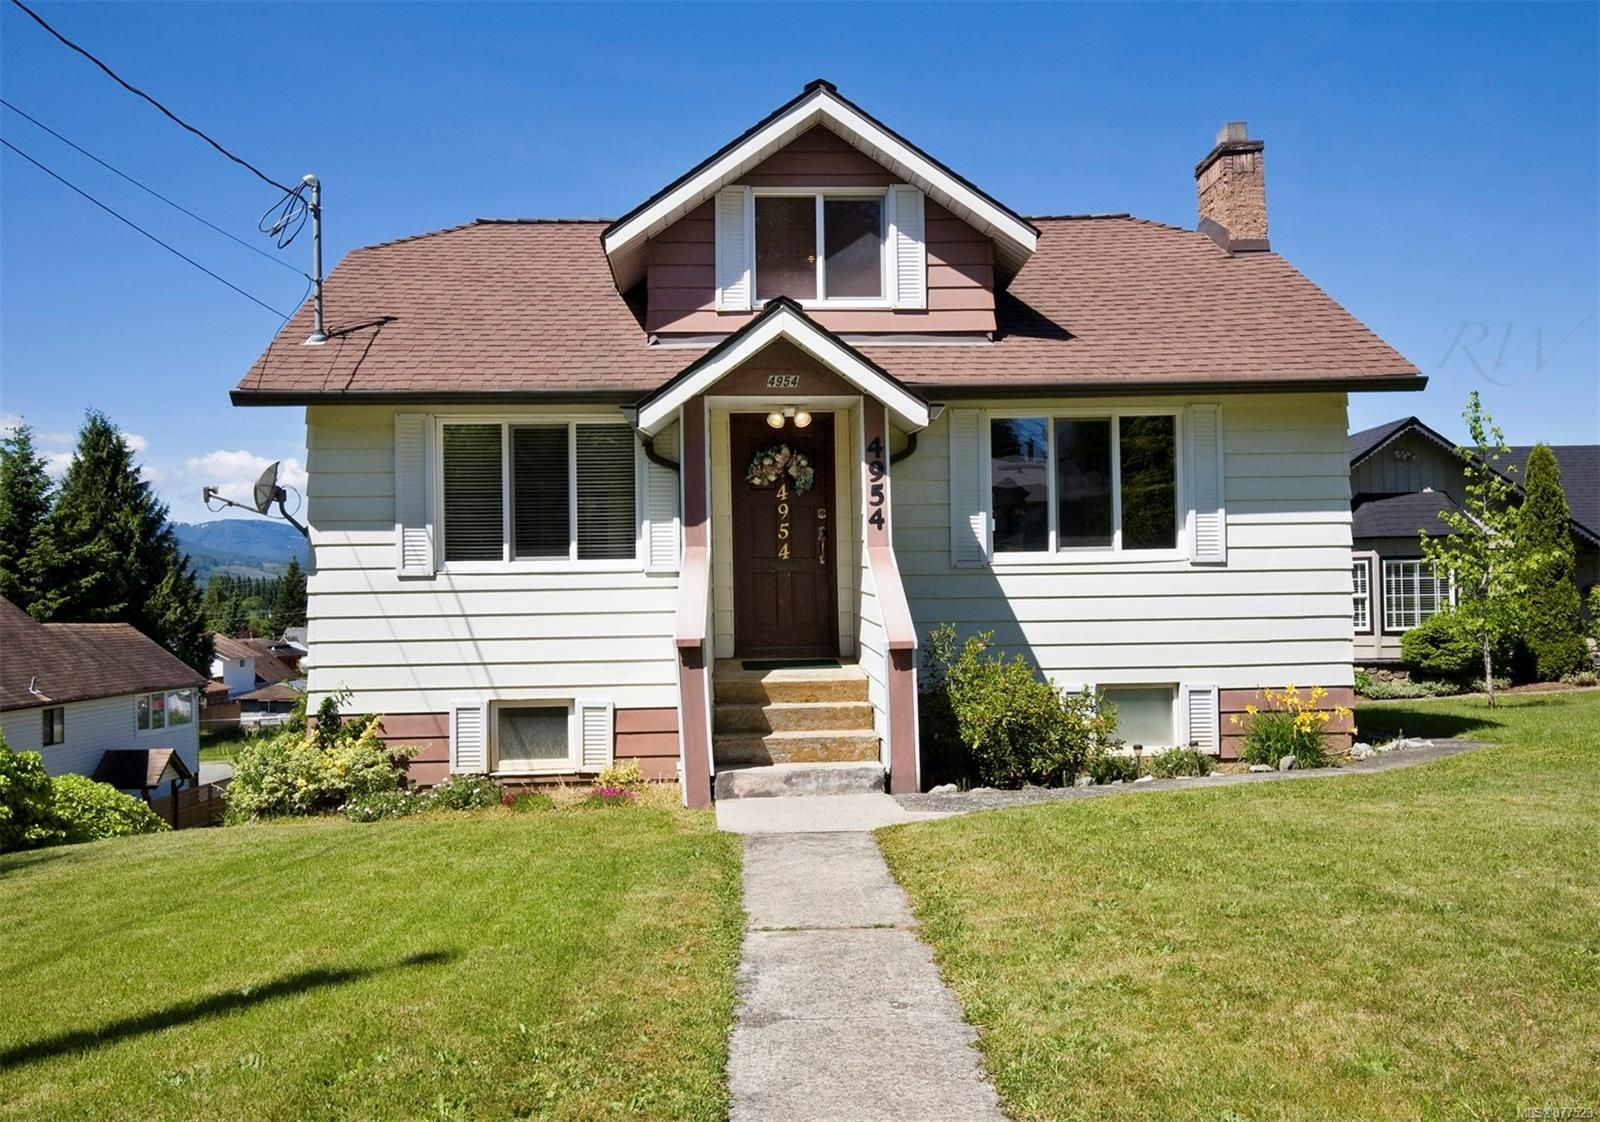 Main Photo: 4954 Spencer St in : PA Port Alberni House for sale (Port Alberni)  : MLS®# 877523